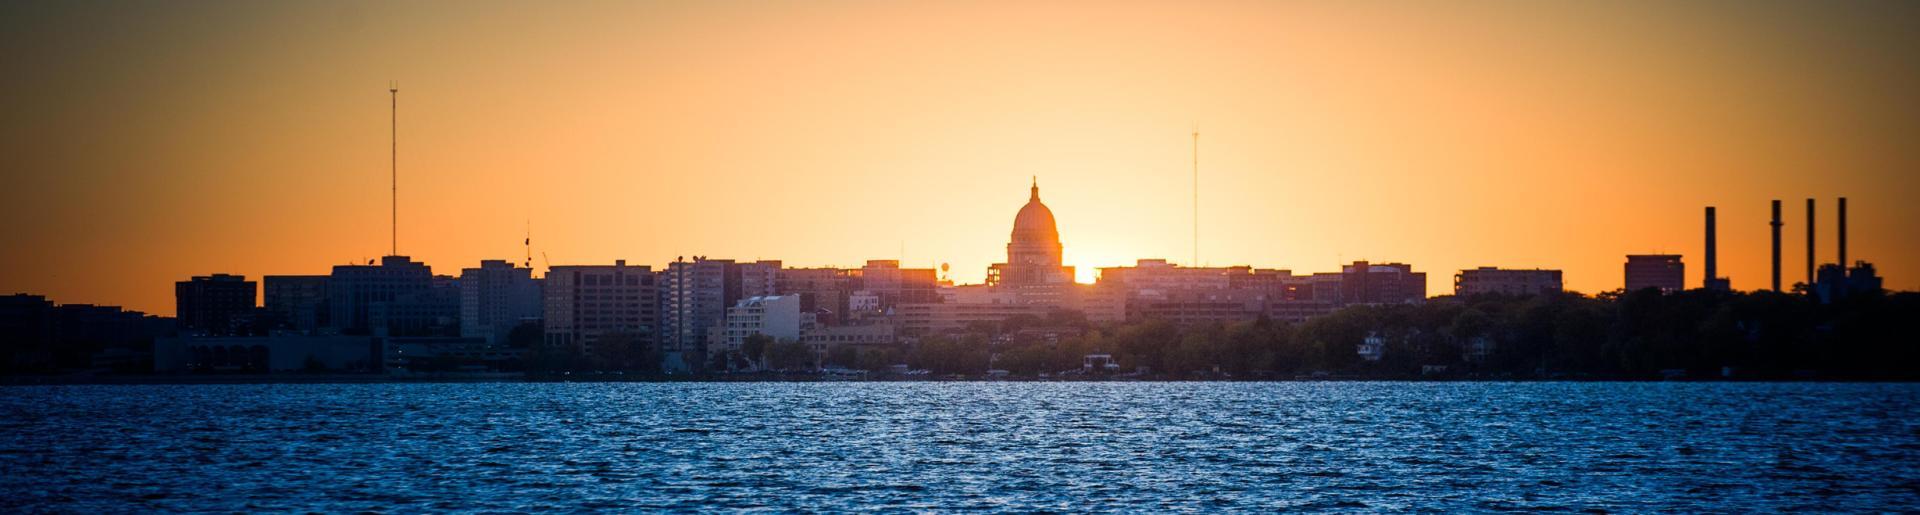 Capitol Skyline at Sunset